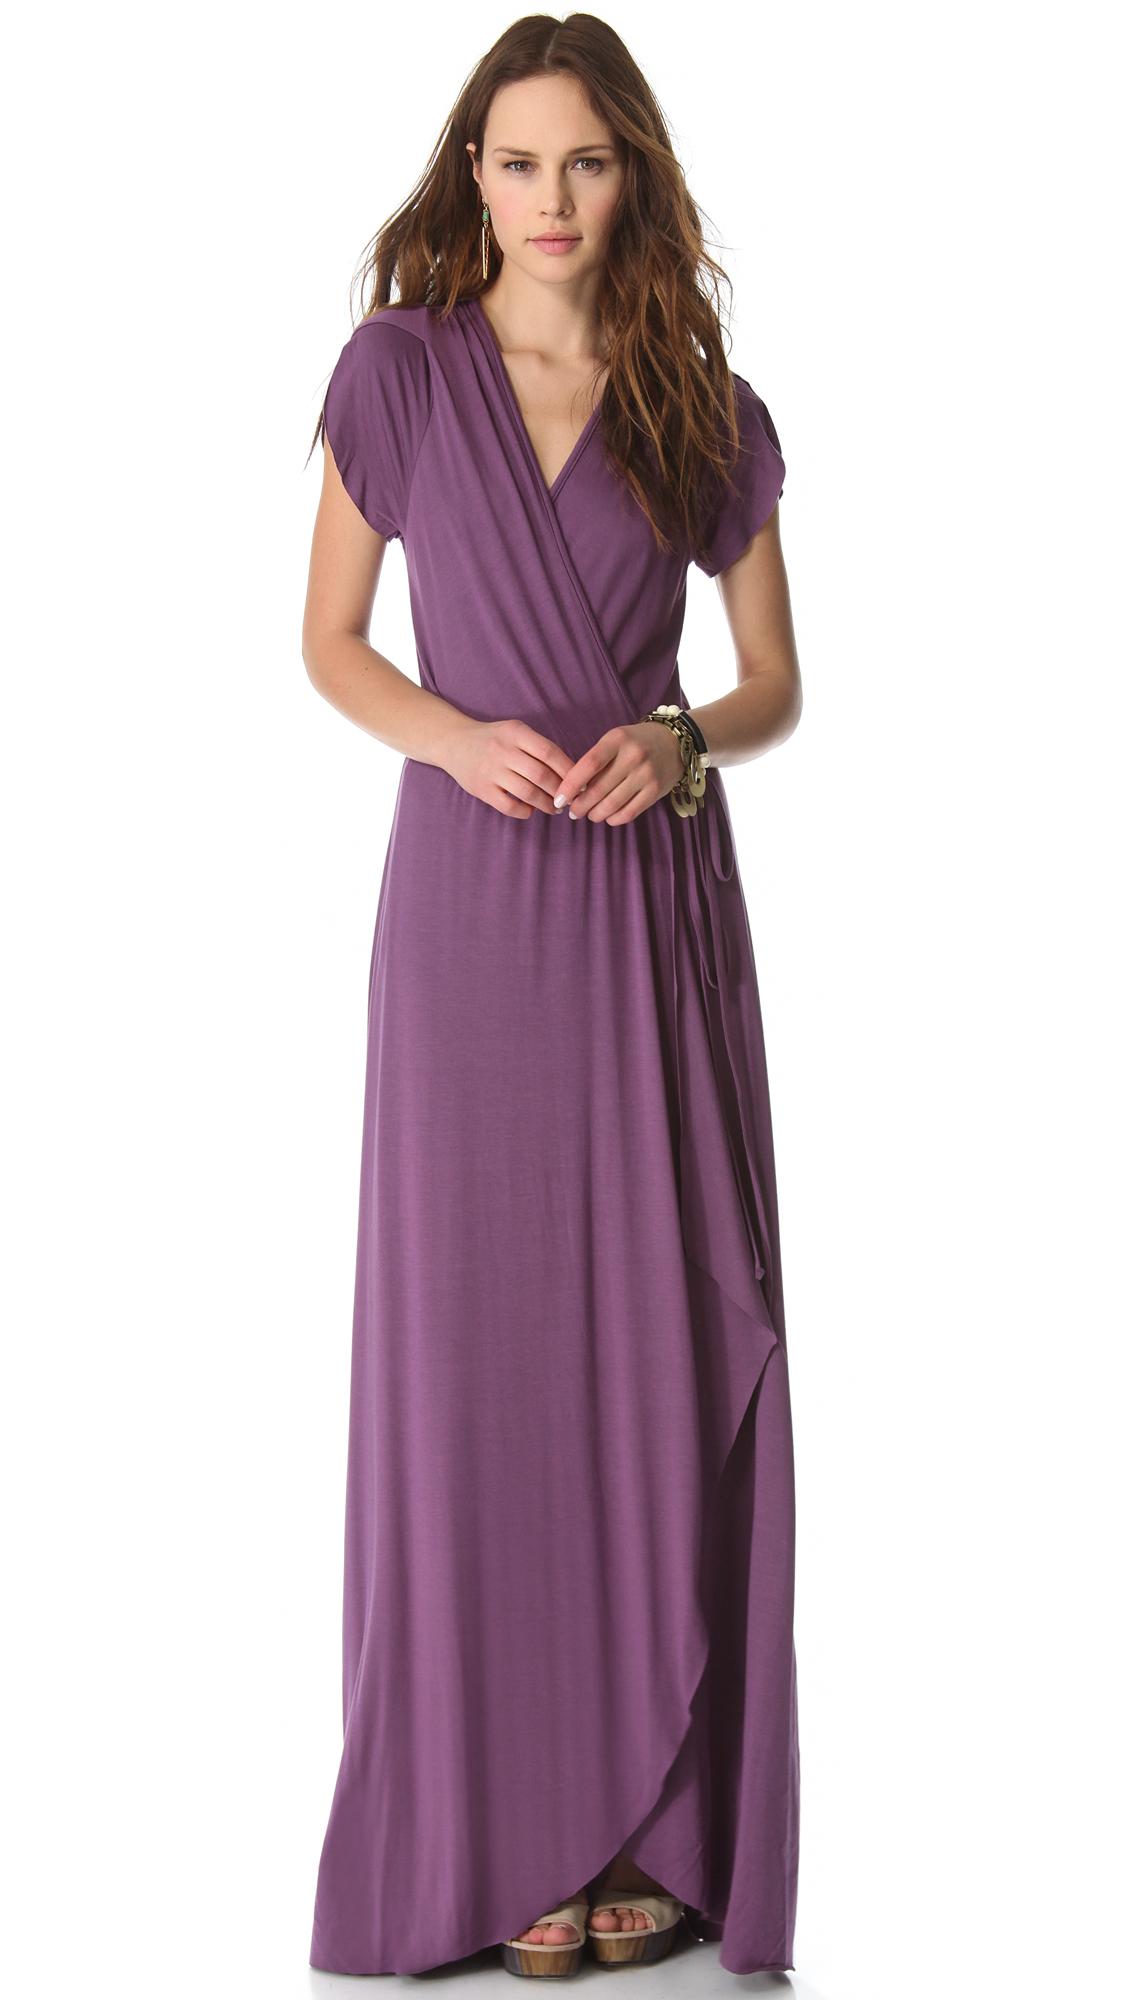 Rachel pally laurent maxi dress